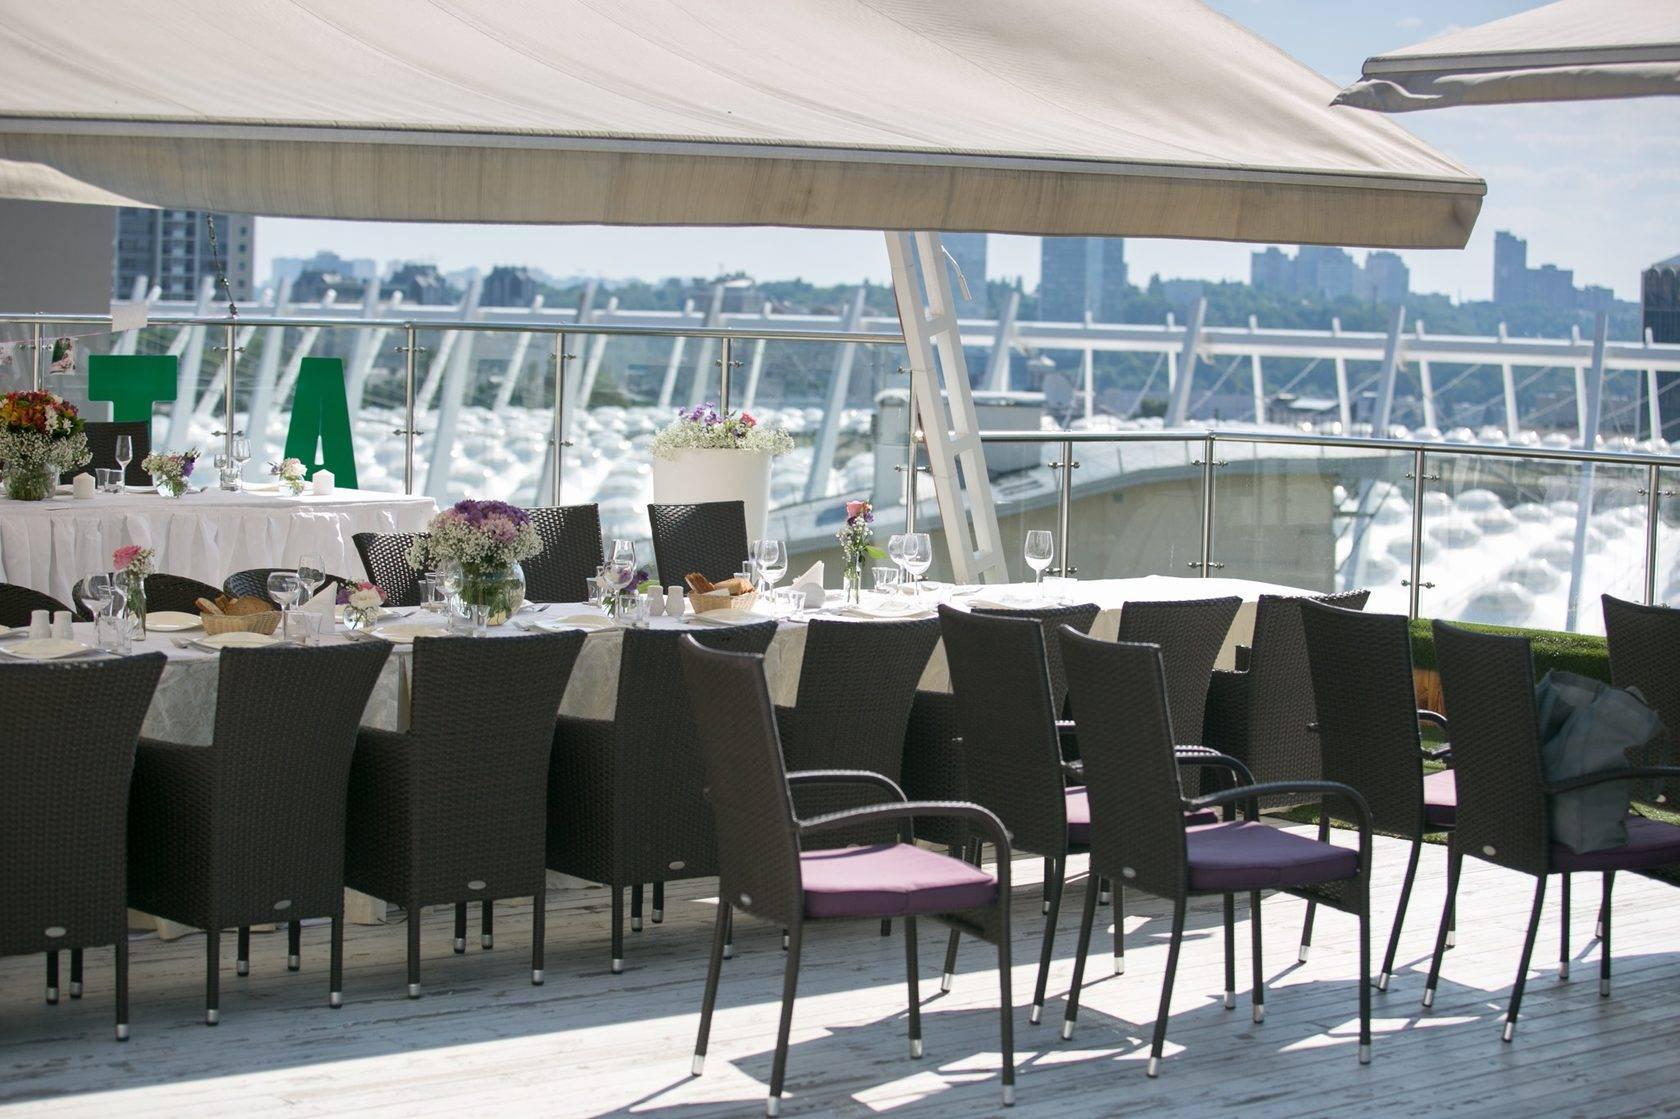 Royal olympic hotel Роял олімпік хотел Олимпиский стадион